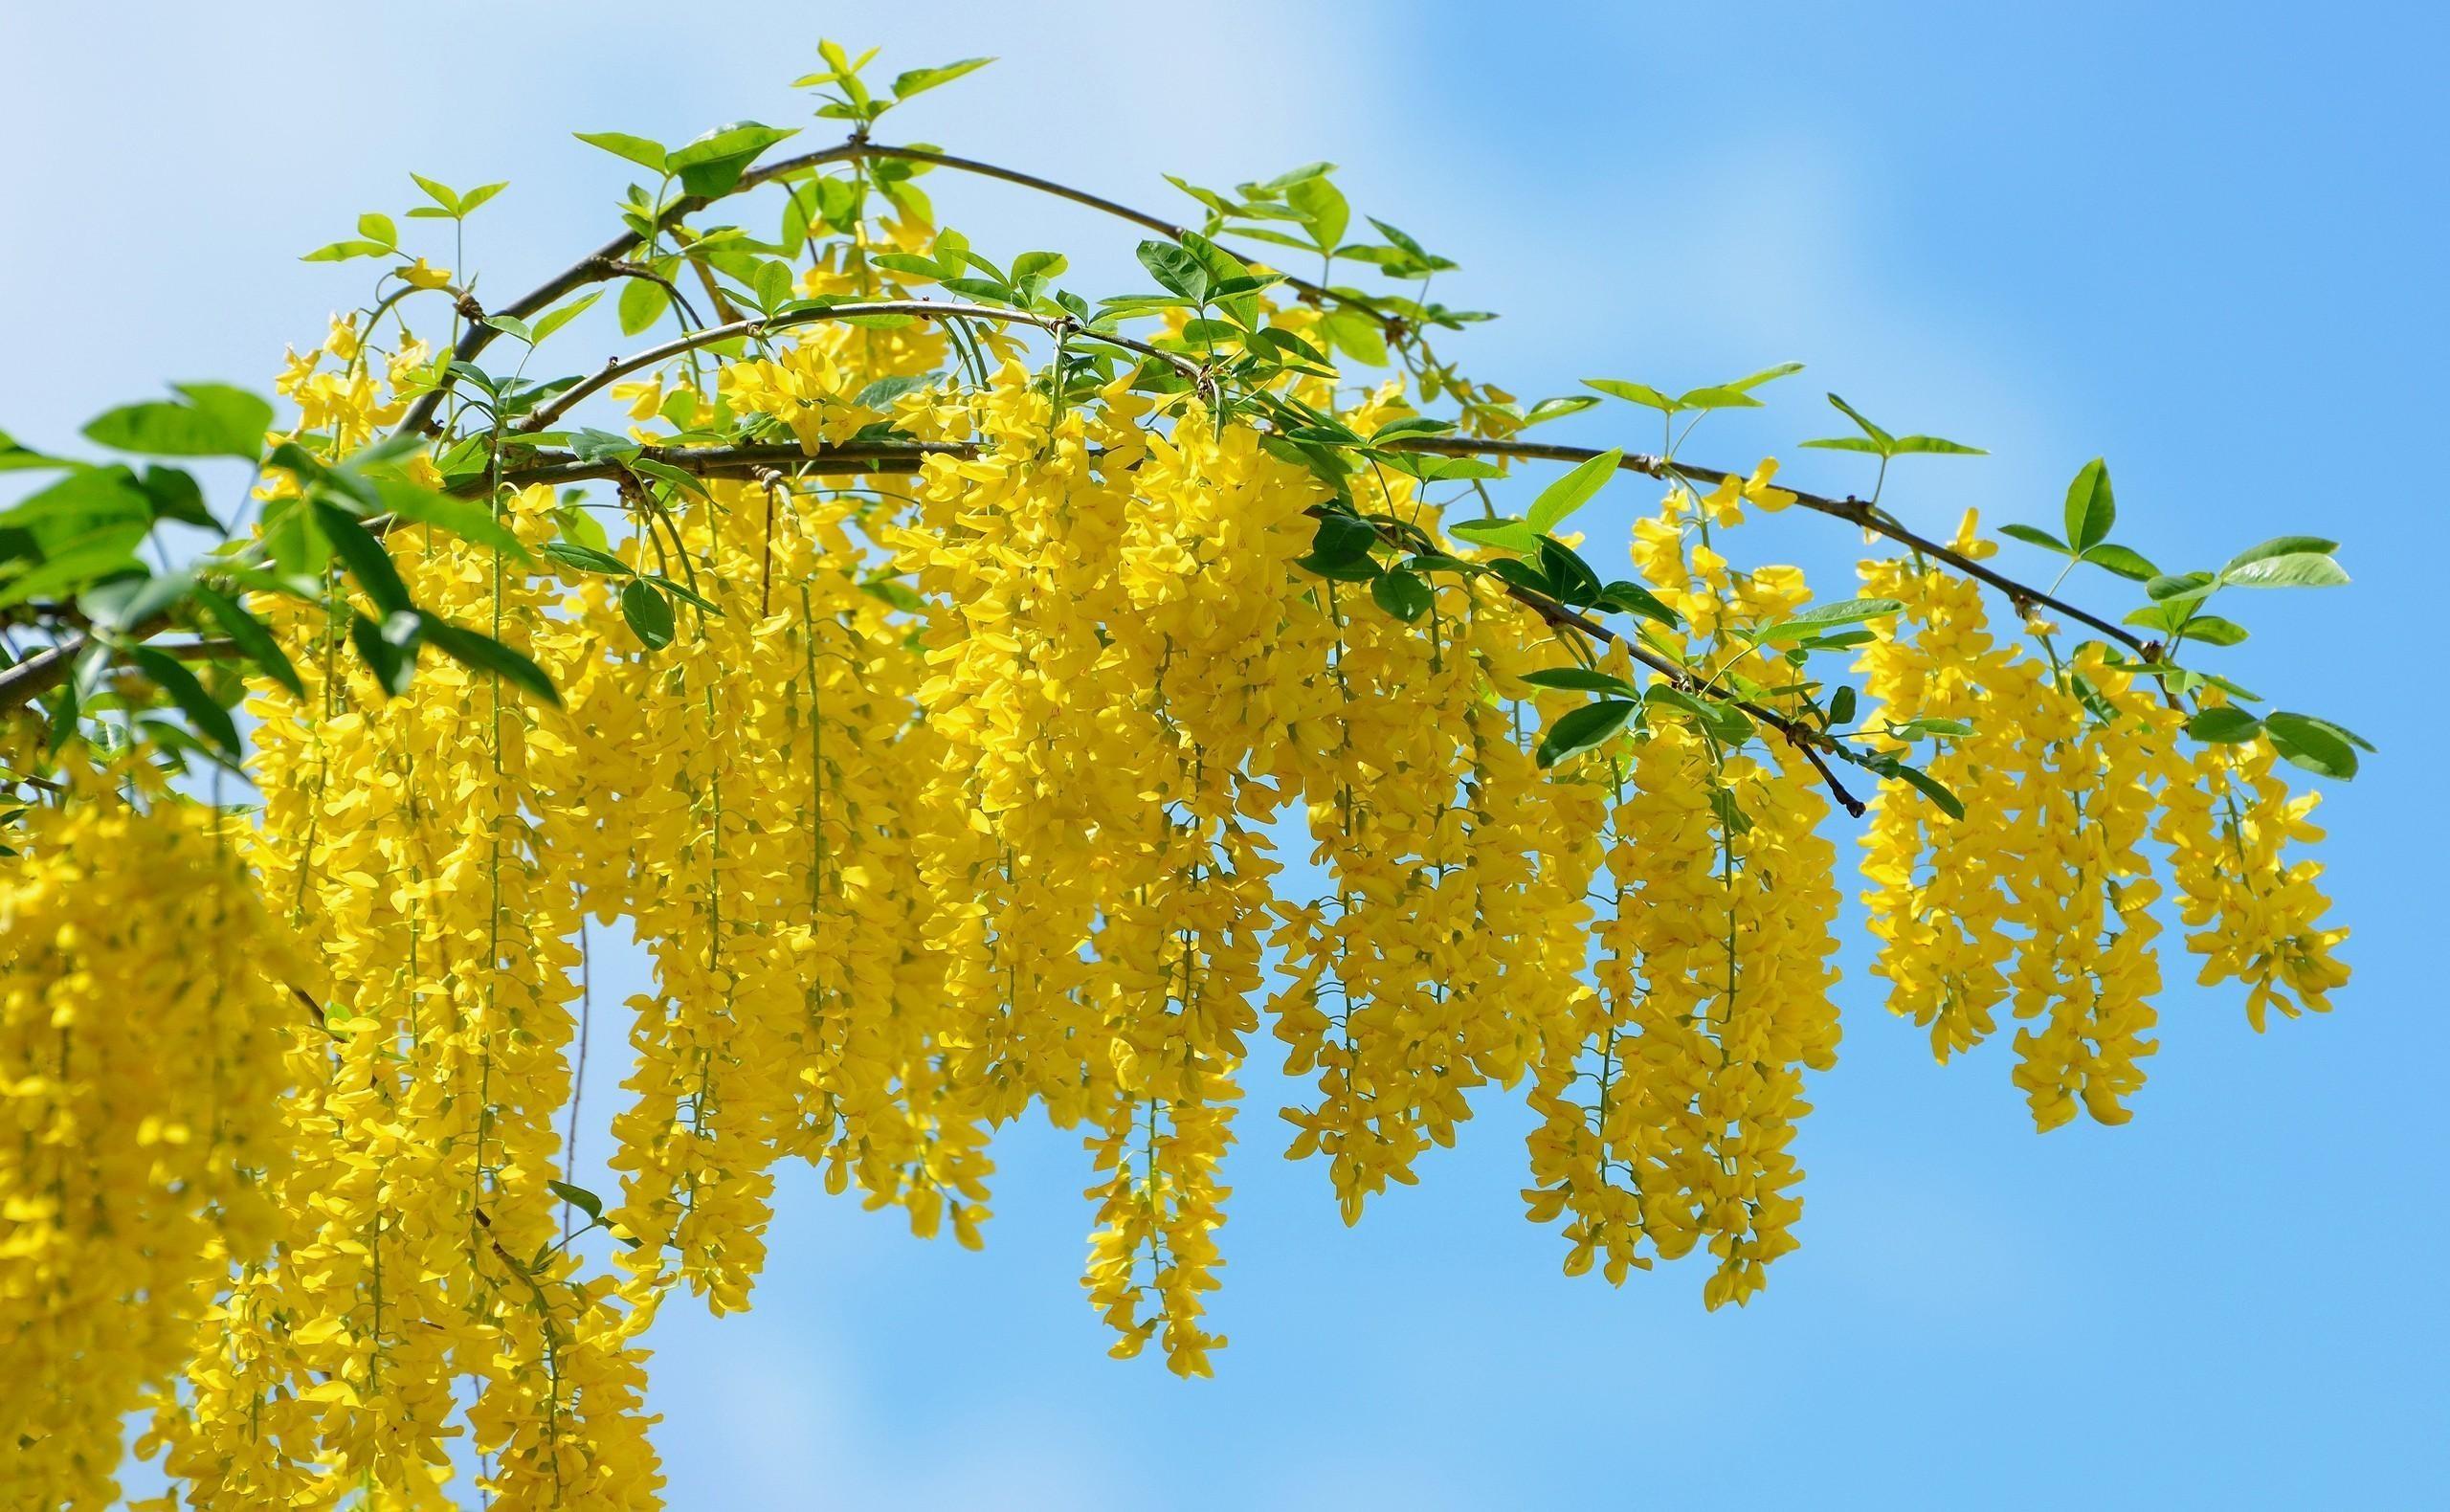 fond d 39 cran lumi re du soleil aliments ciel branche fruit jaune mimosa ensoleill. Black Bedroom Furniture Sets. Home Design Ideas